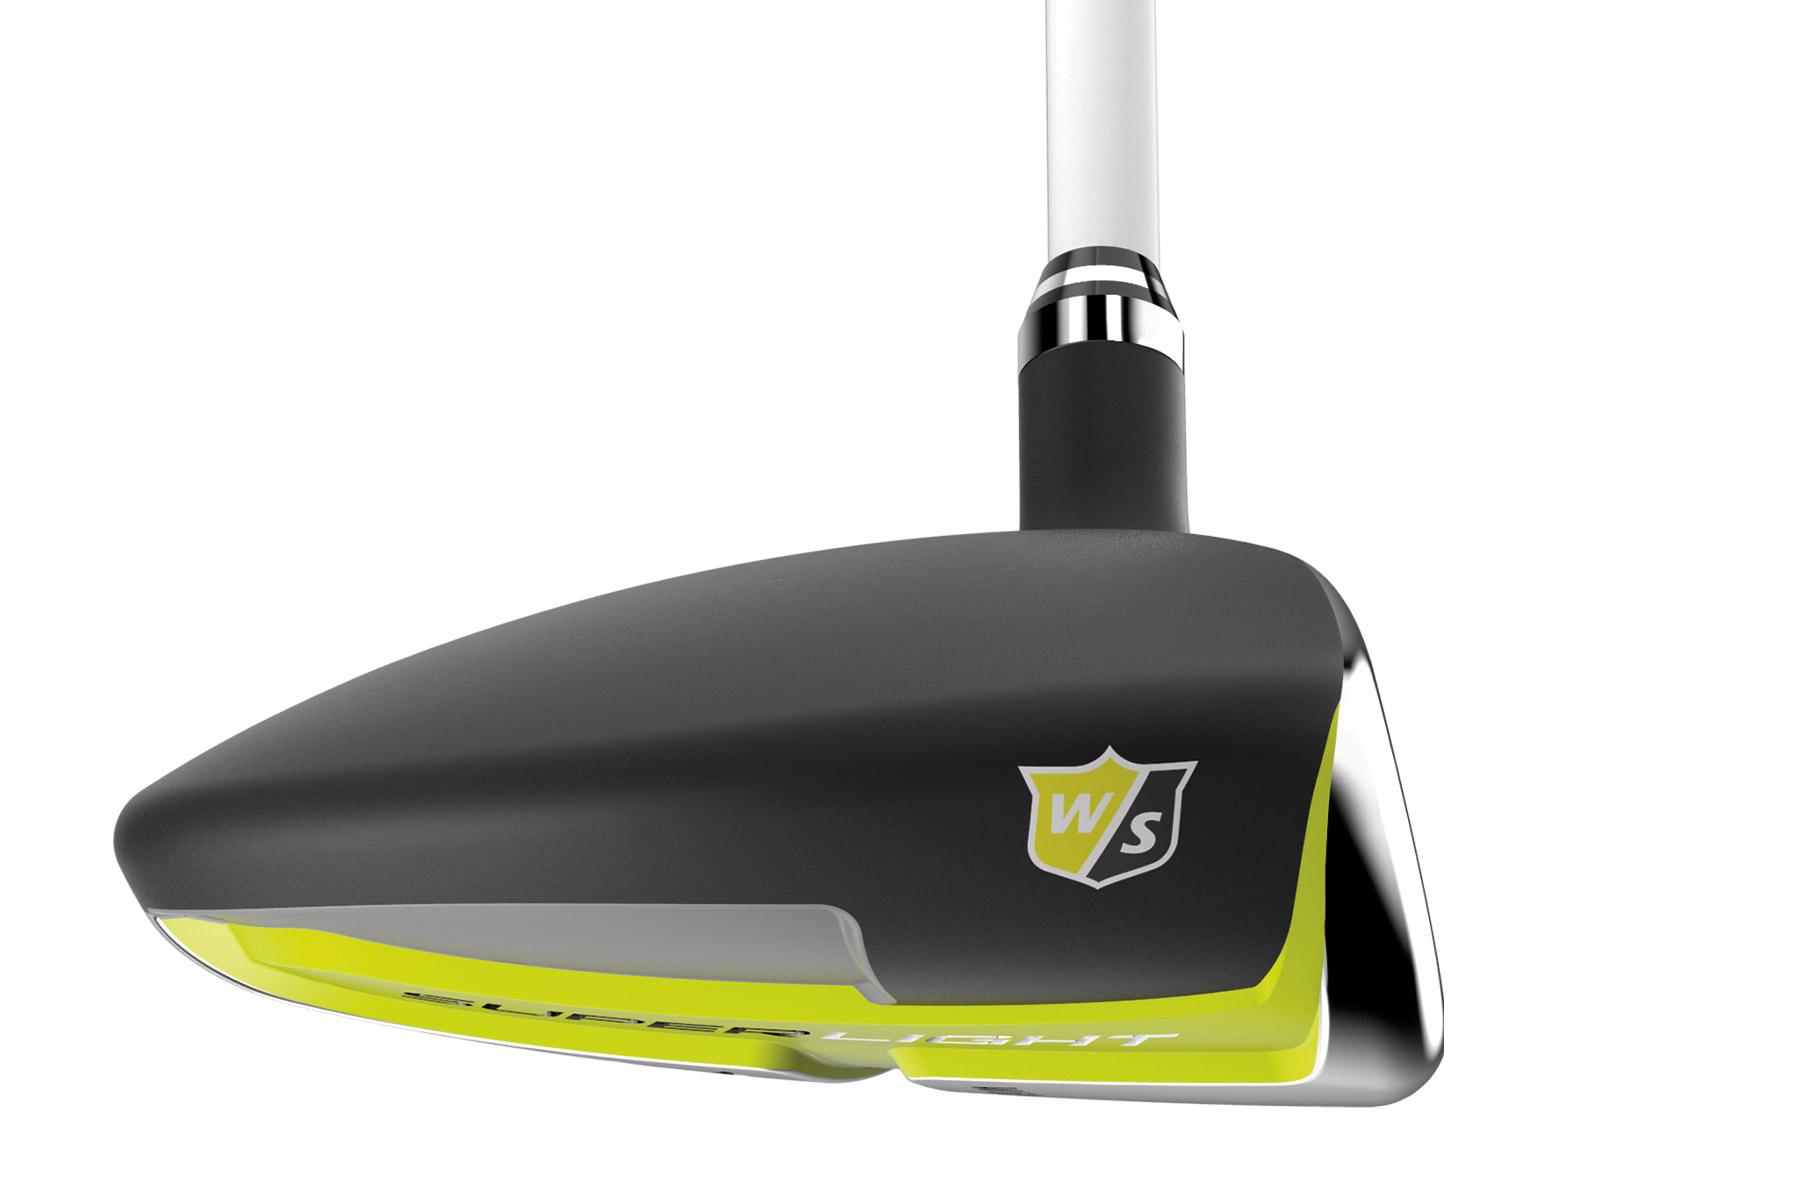 Wilson Ladies D200 Fairway Wood Online Golf